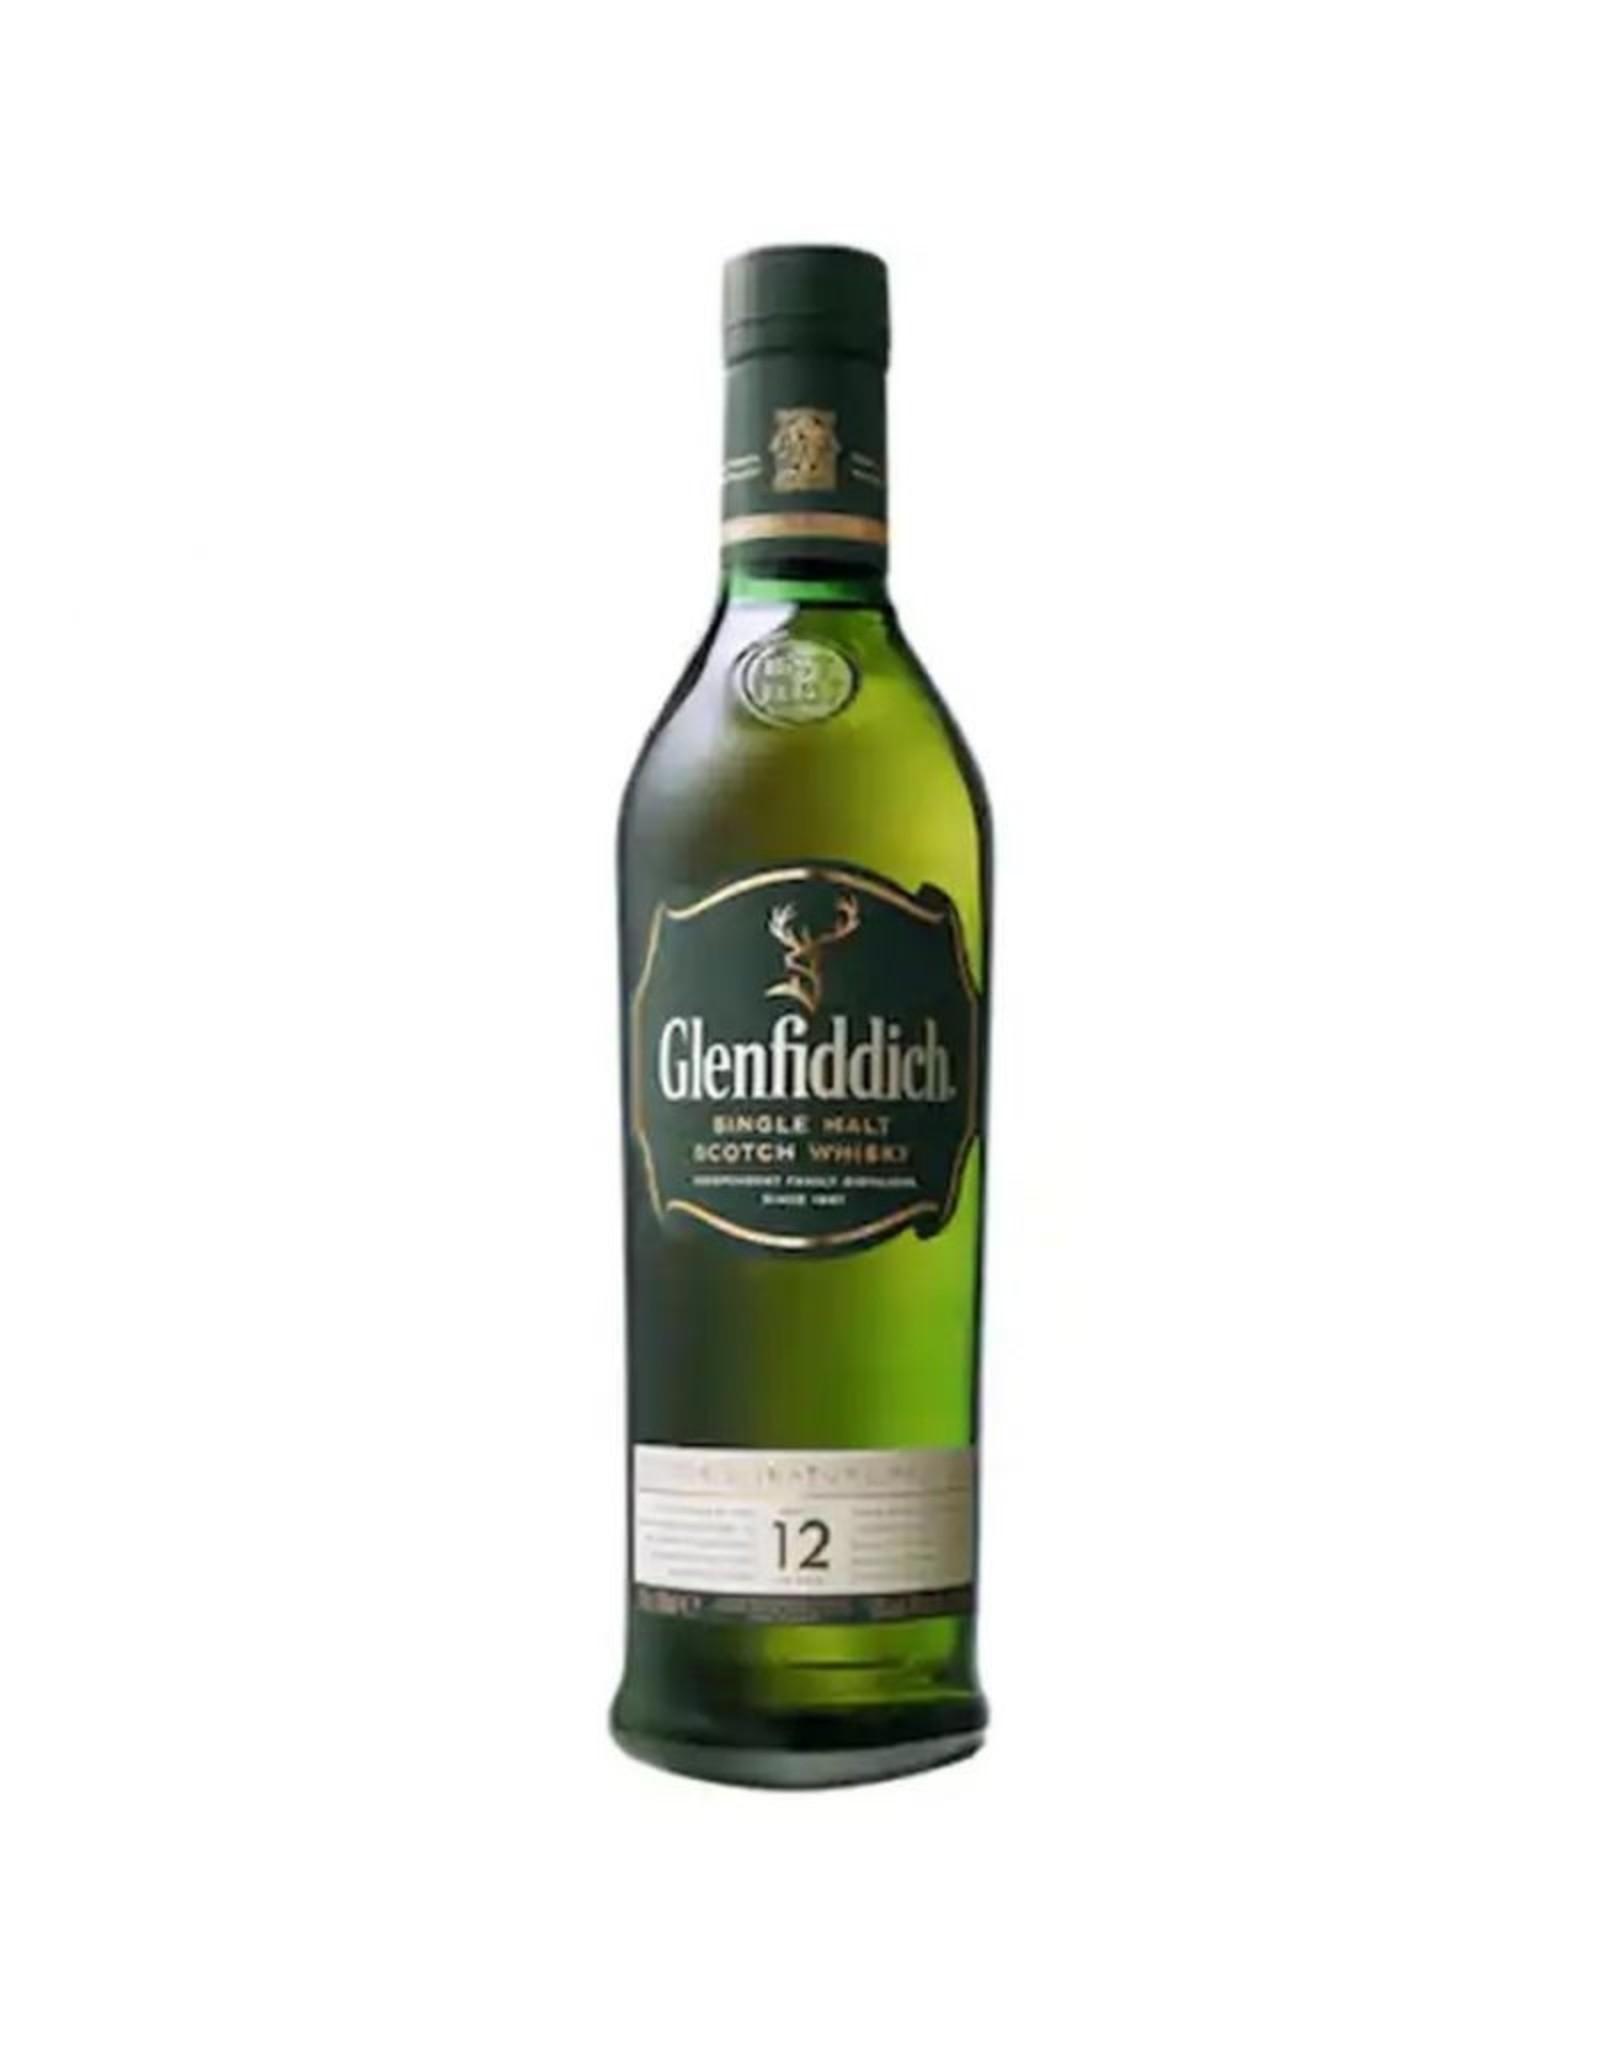 Glenfiddich Glenfiddich 12 years